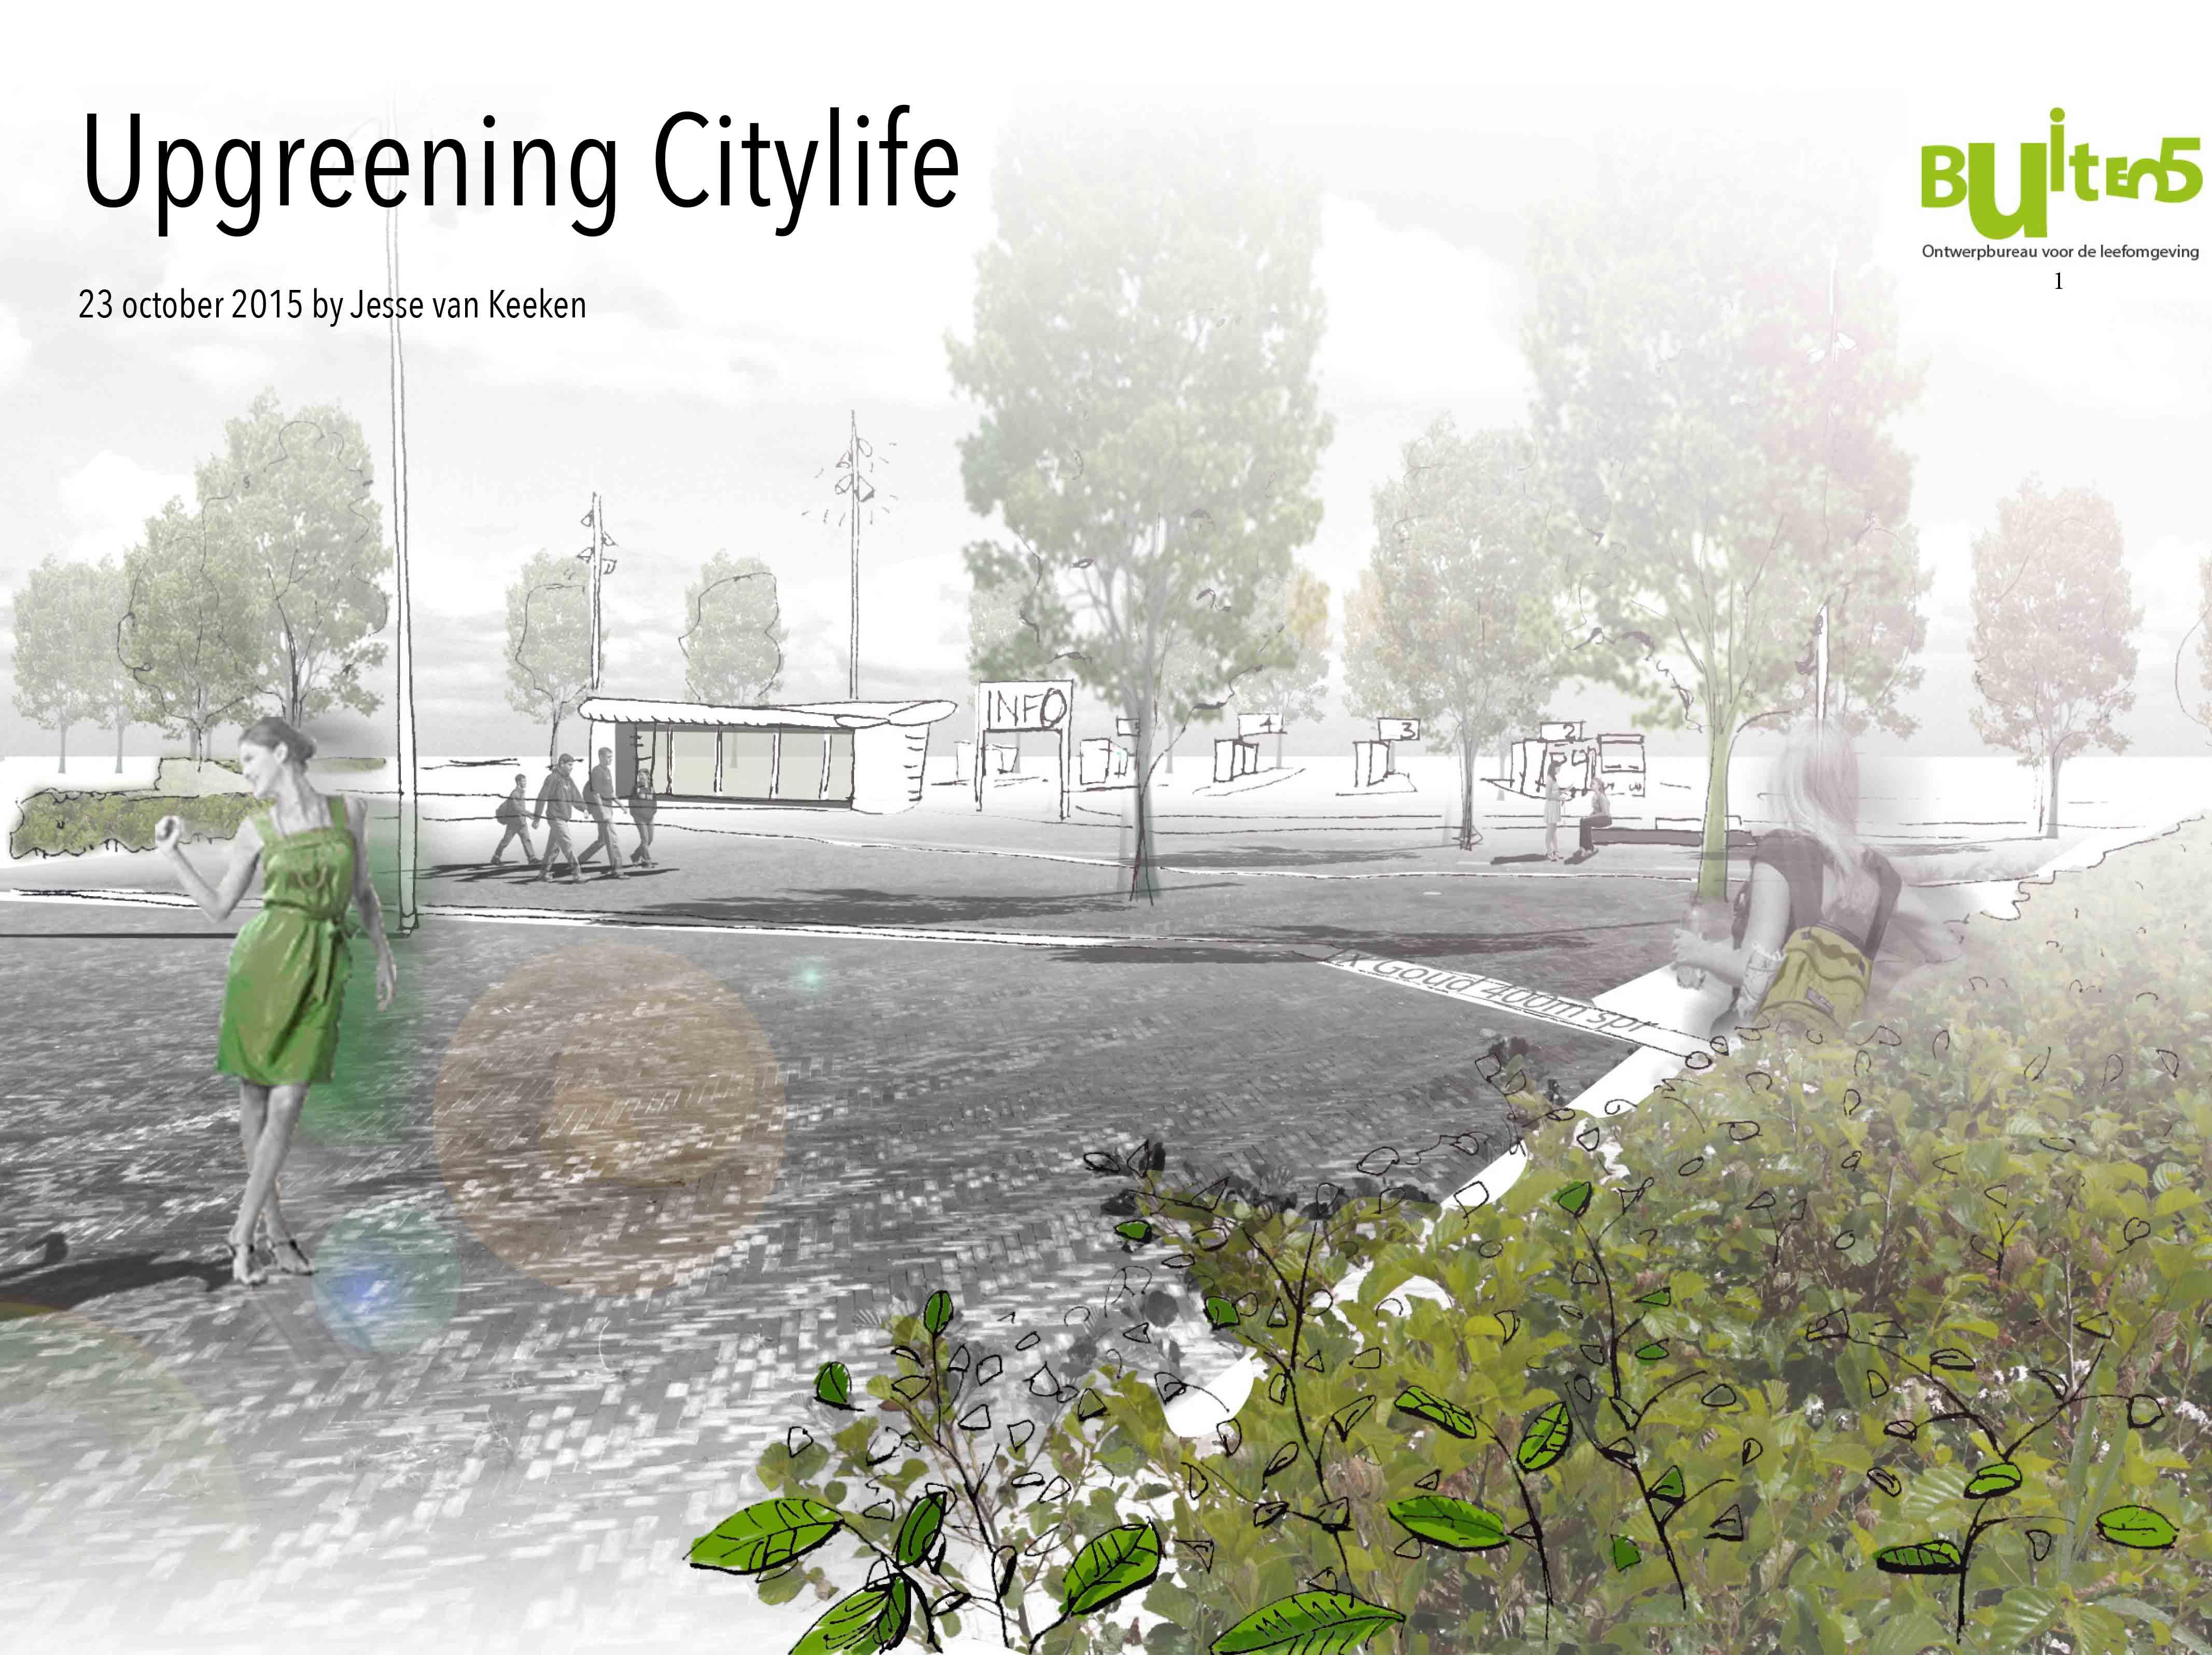 Upgreening city life